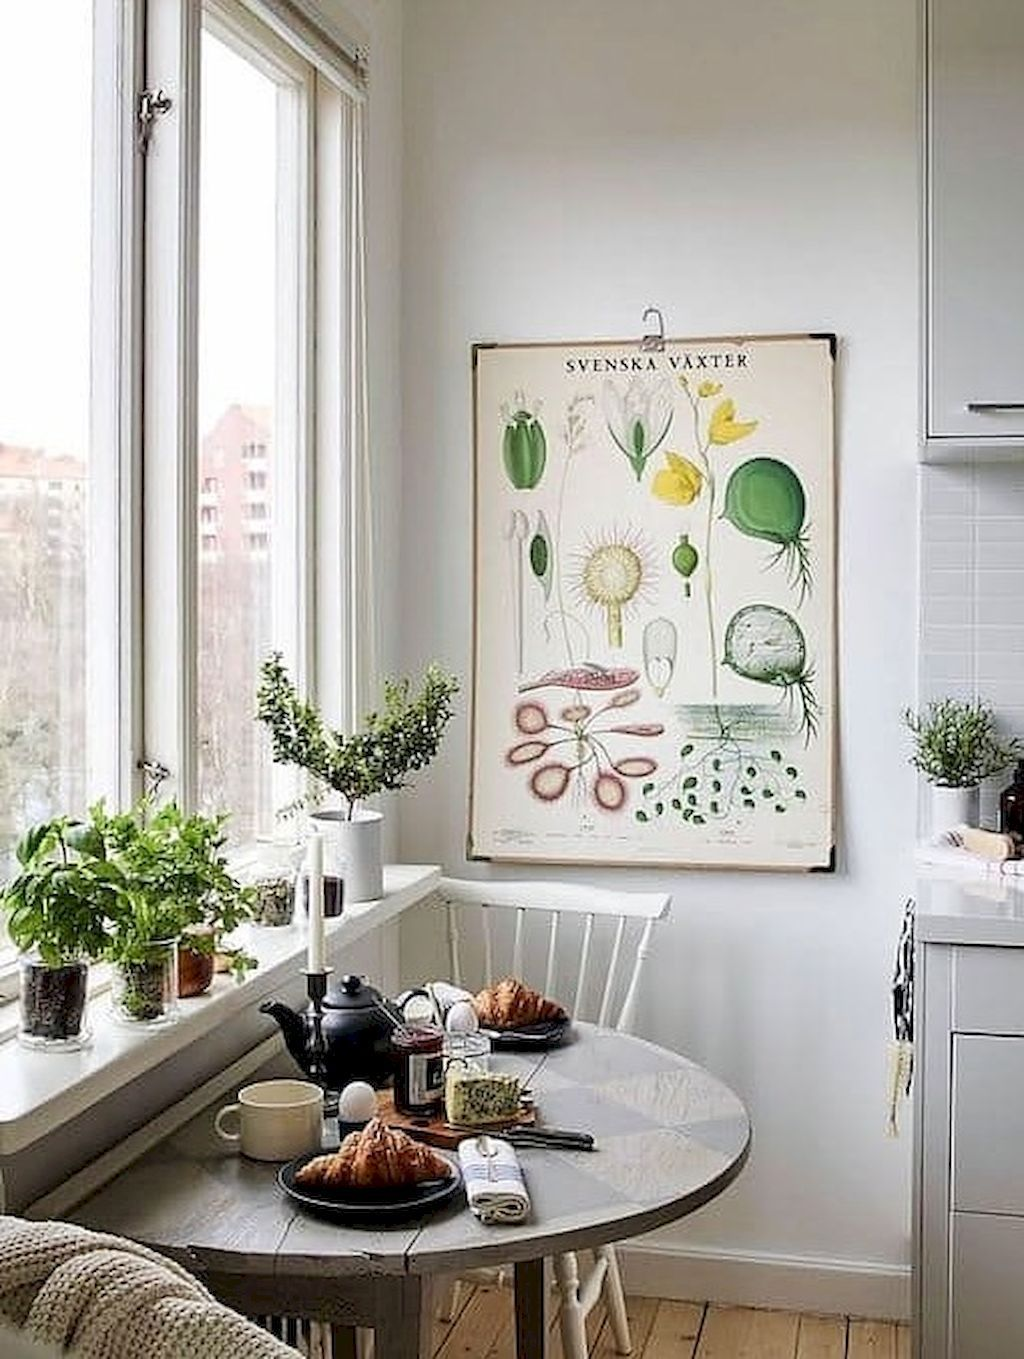 Adorable 30 affordable rental apartment decorating ideas - Rental apartment interior design ...